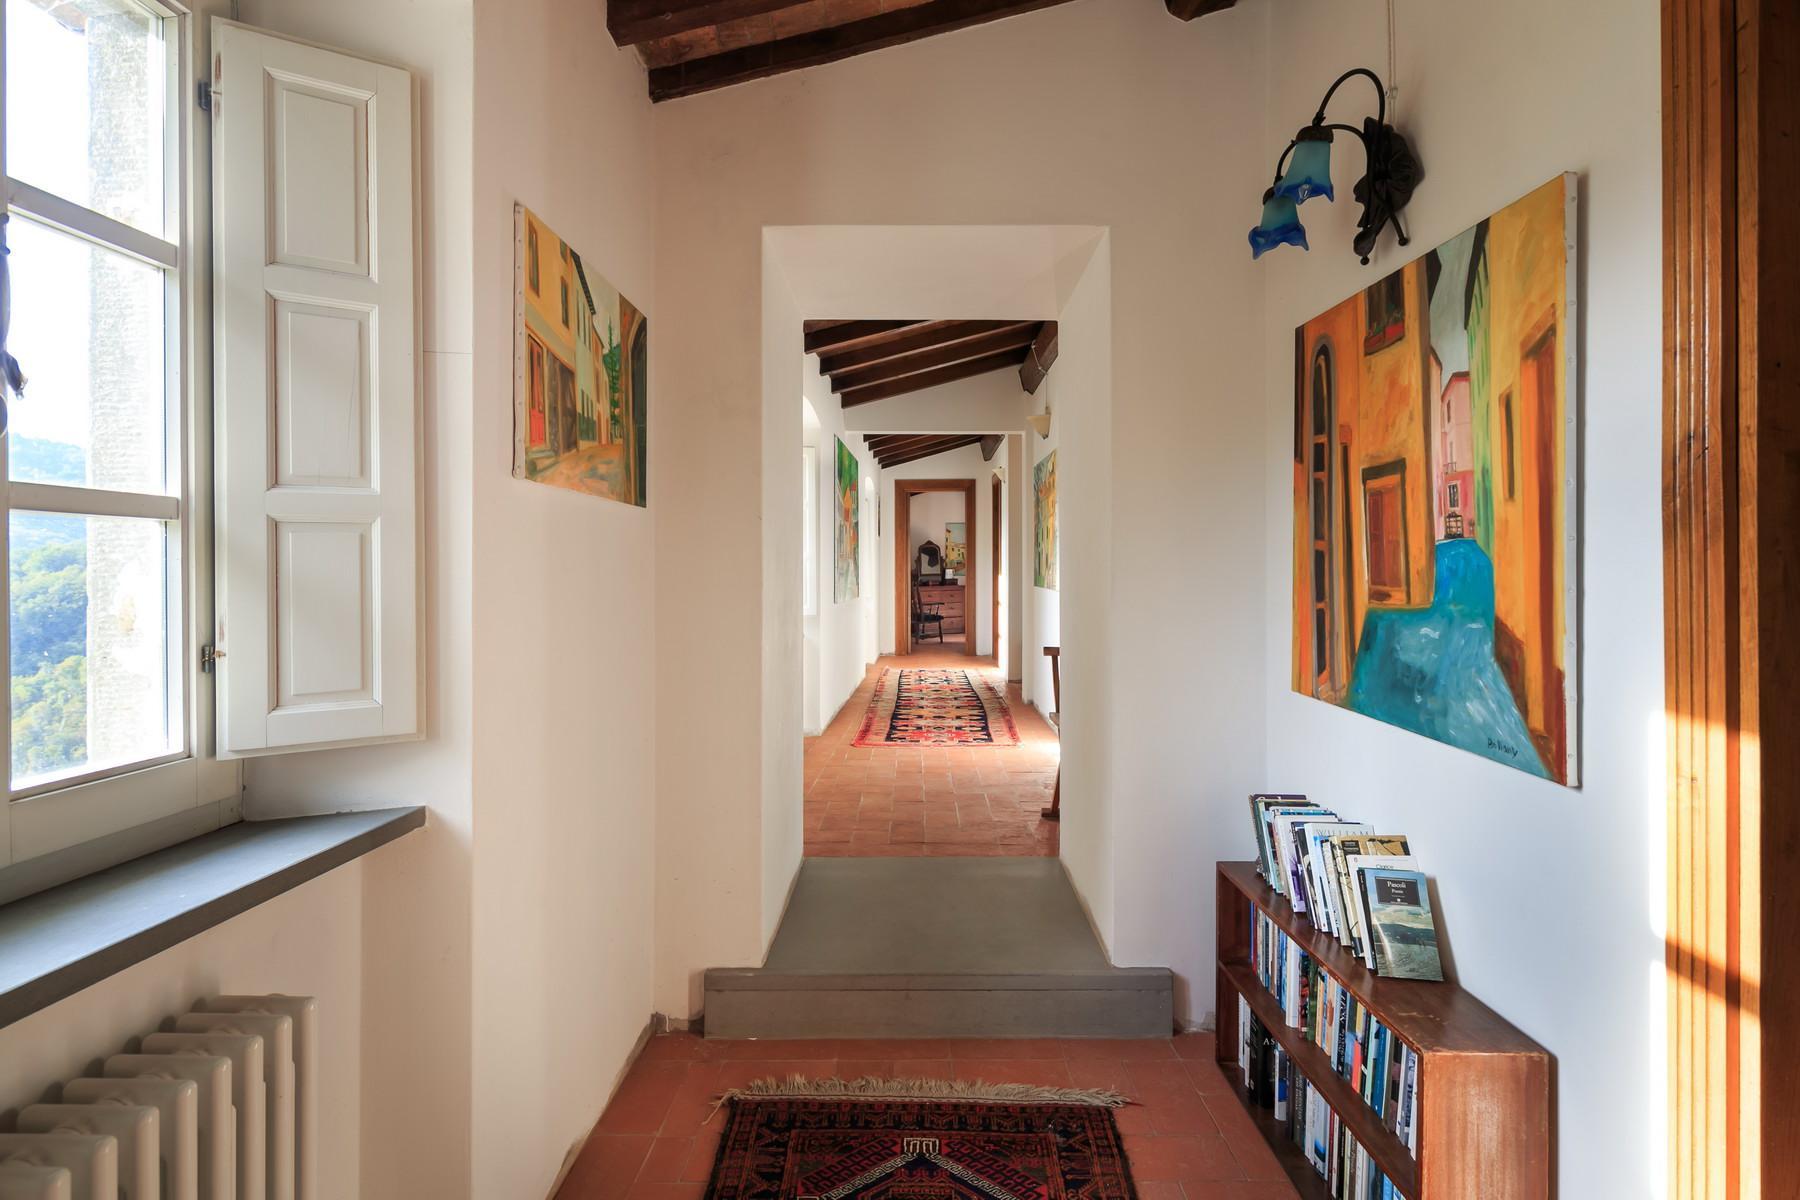 Splendid villa among the hills of Lucca - 17